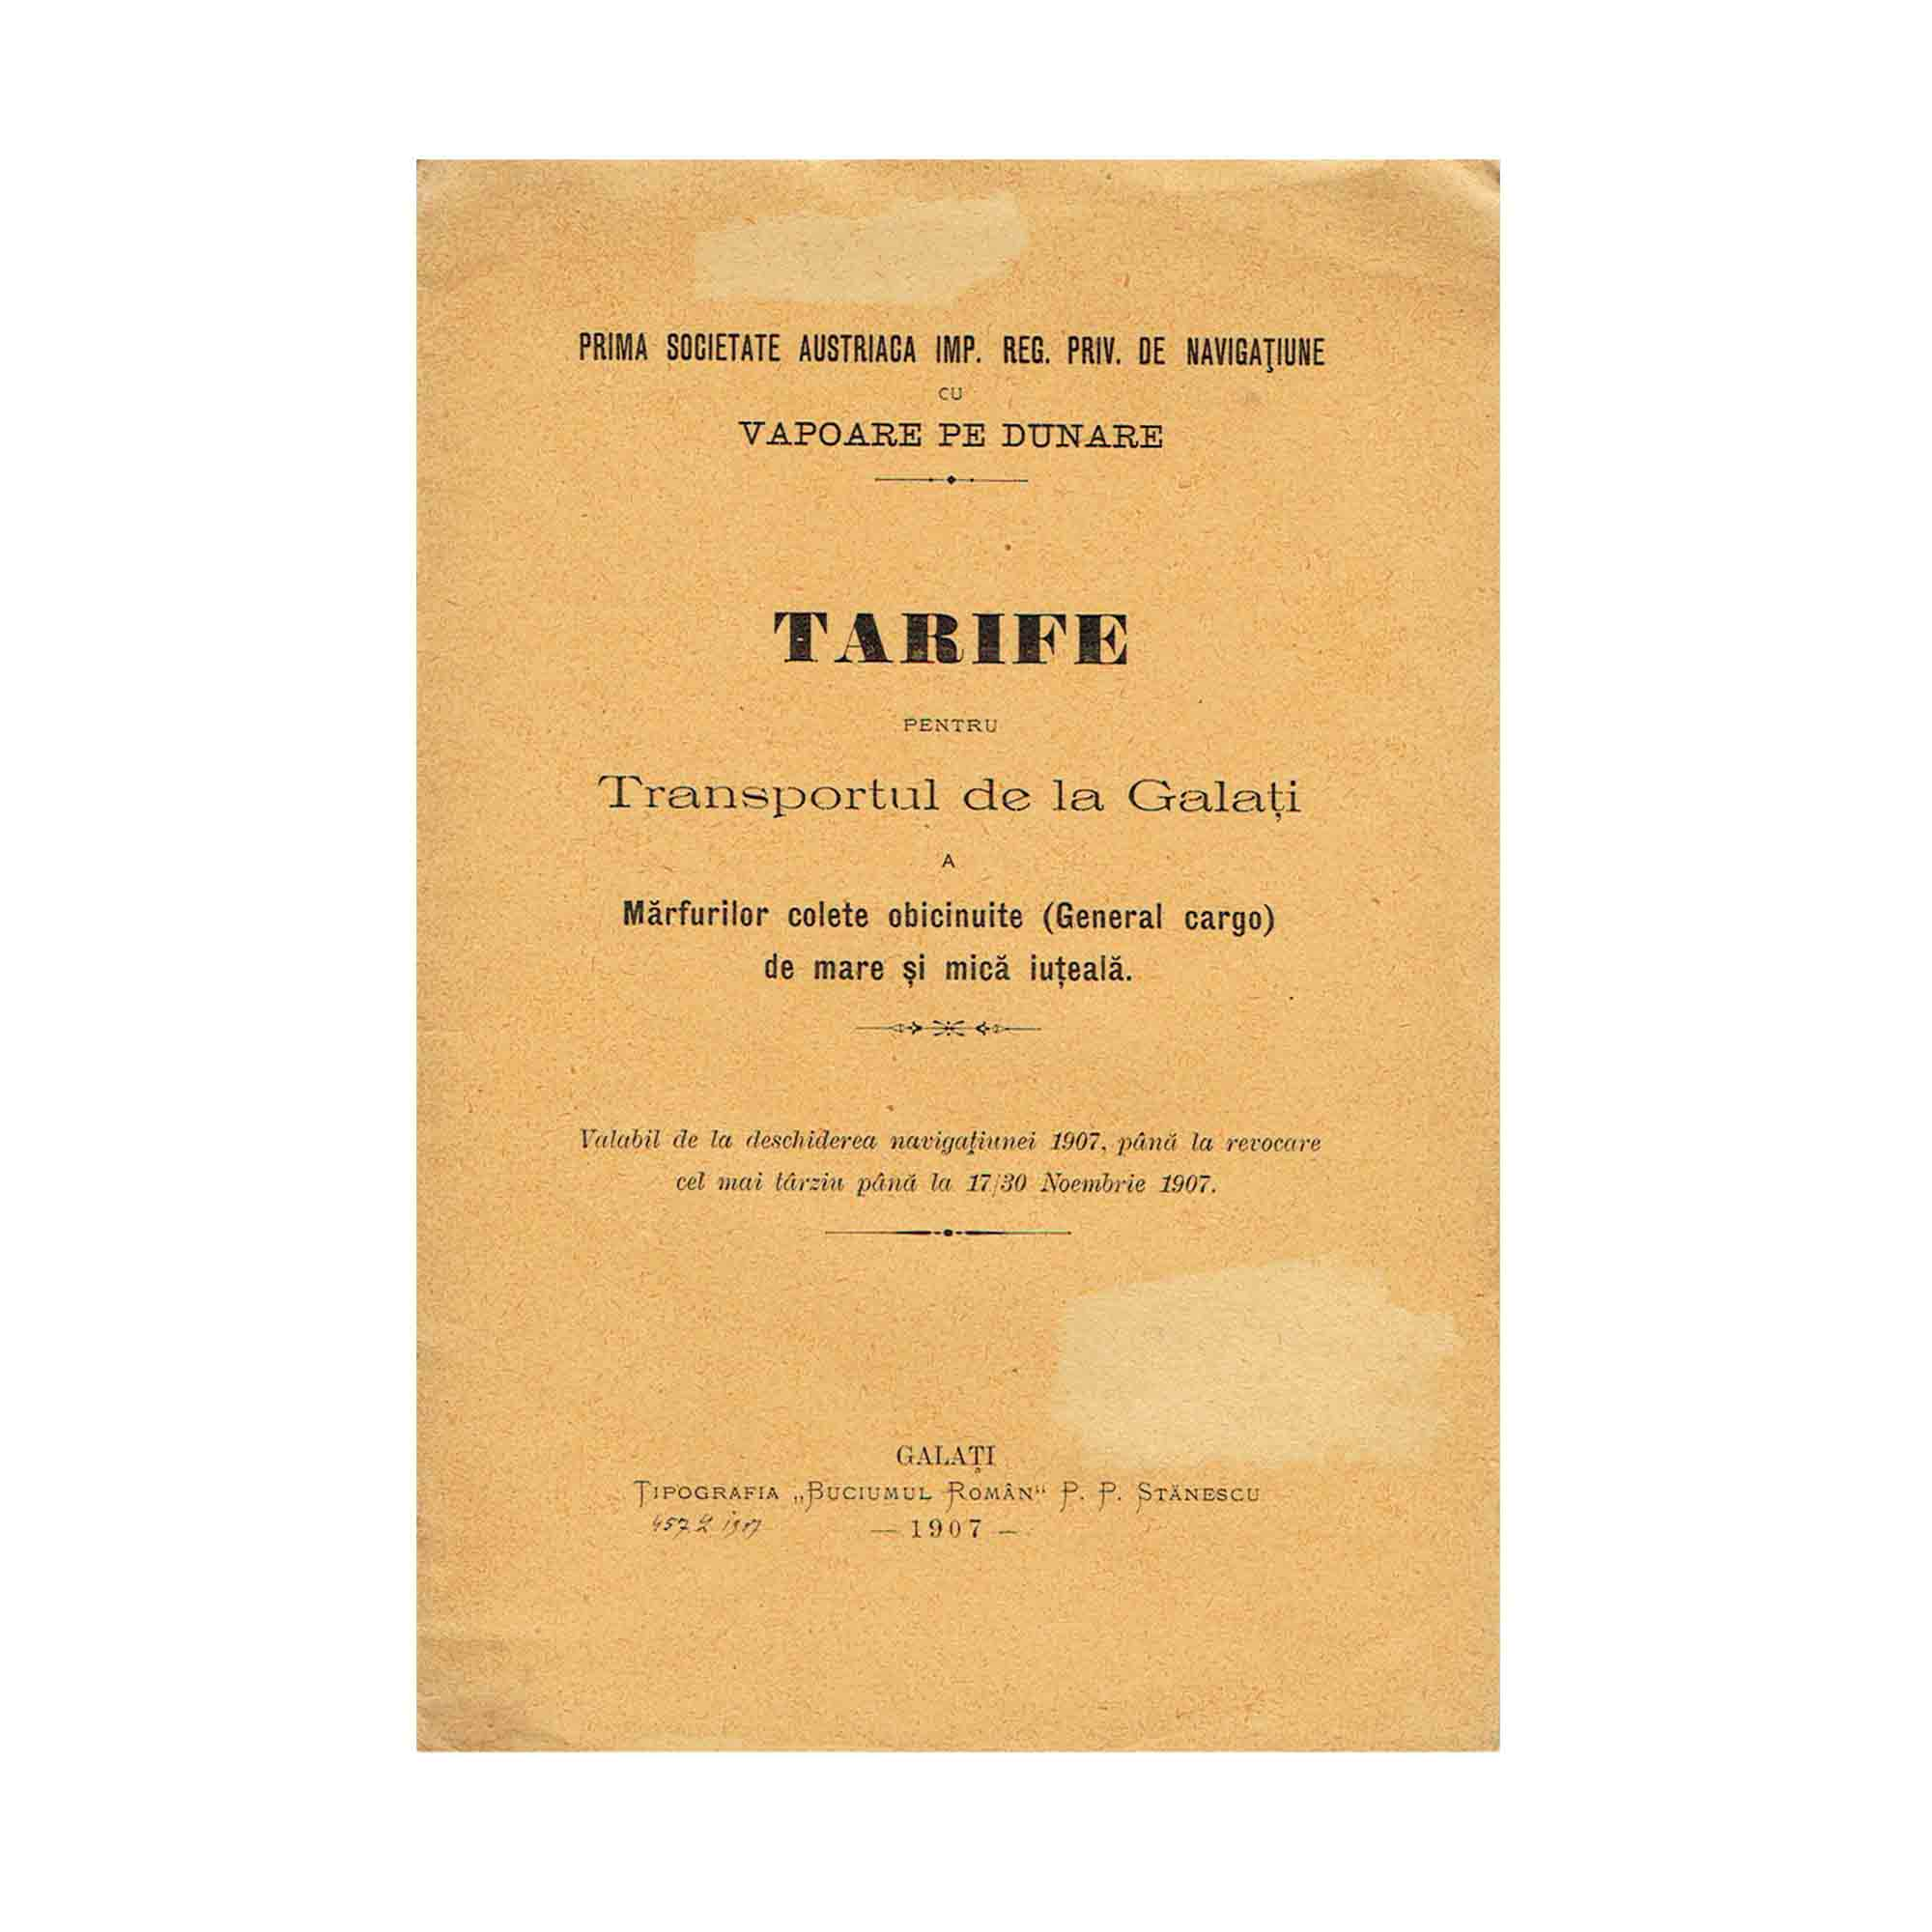 5455-DDSG-Tarife-Rumaenien-1907-Umschlag-N.jpg